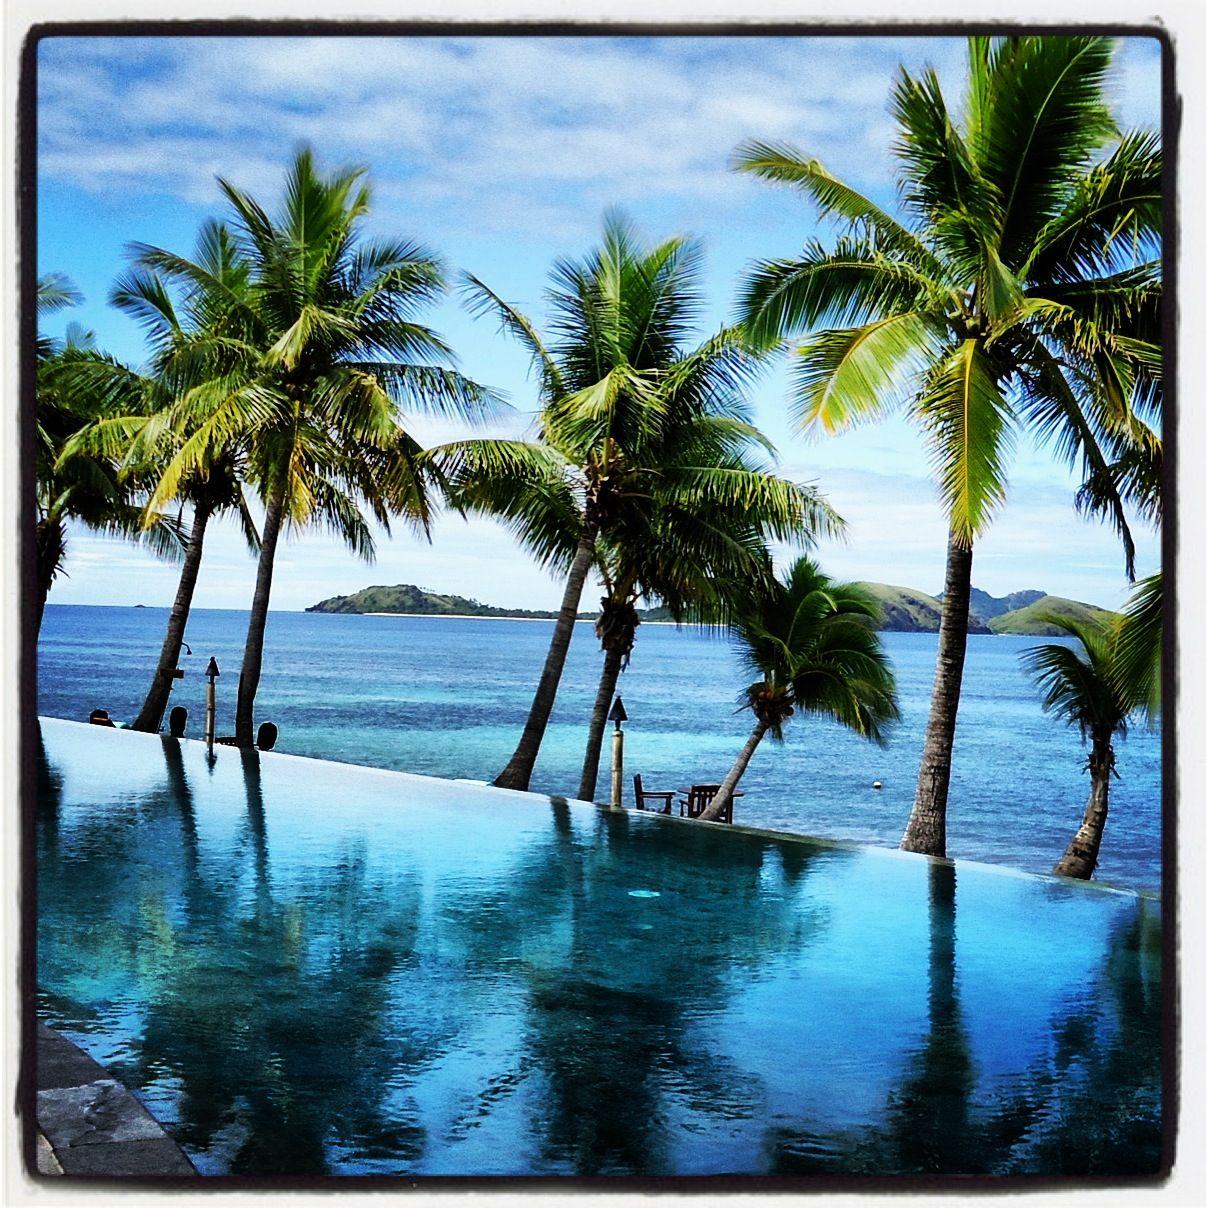 Fiji Beaches: Beautiful Islands, Trip, Lake